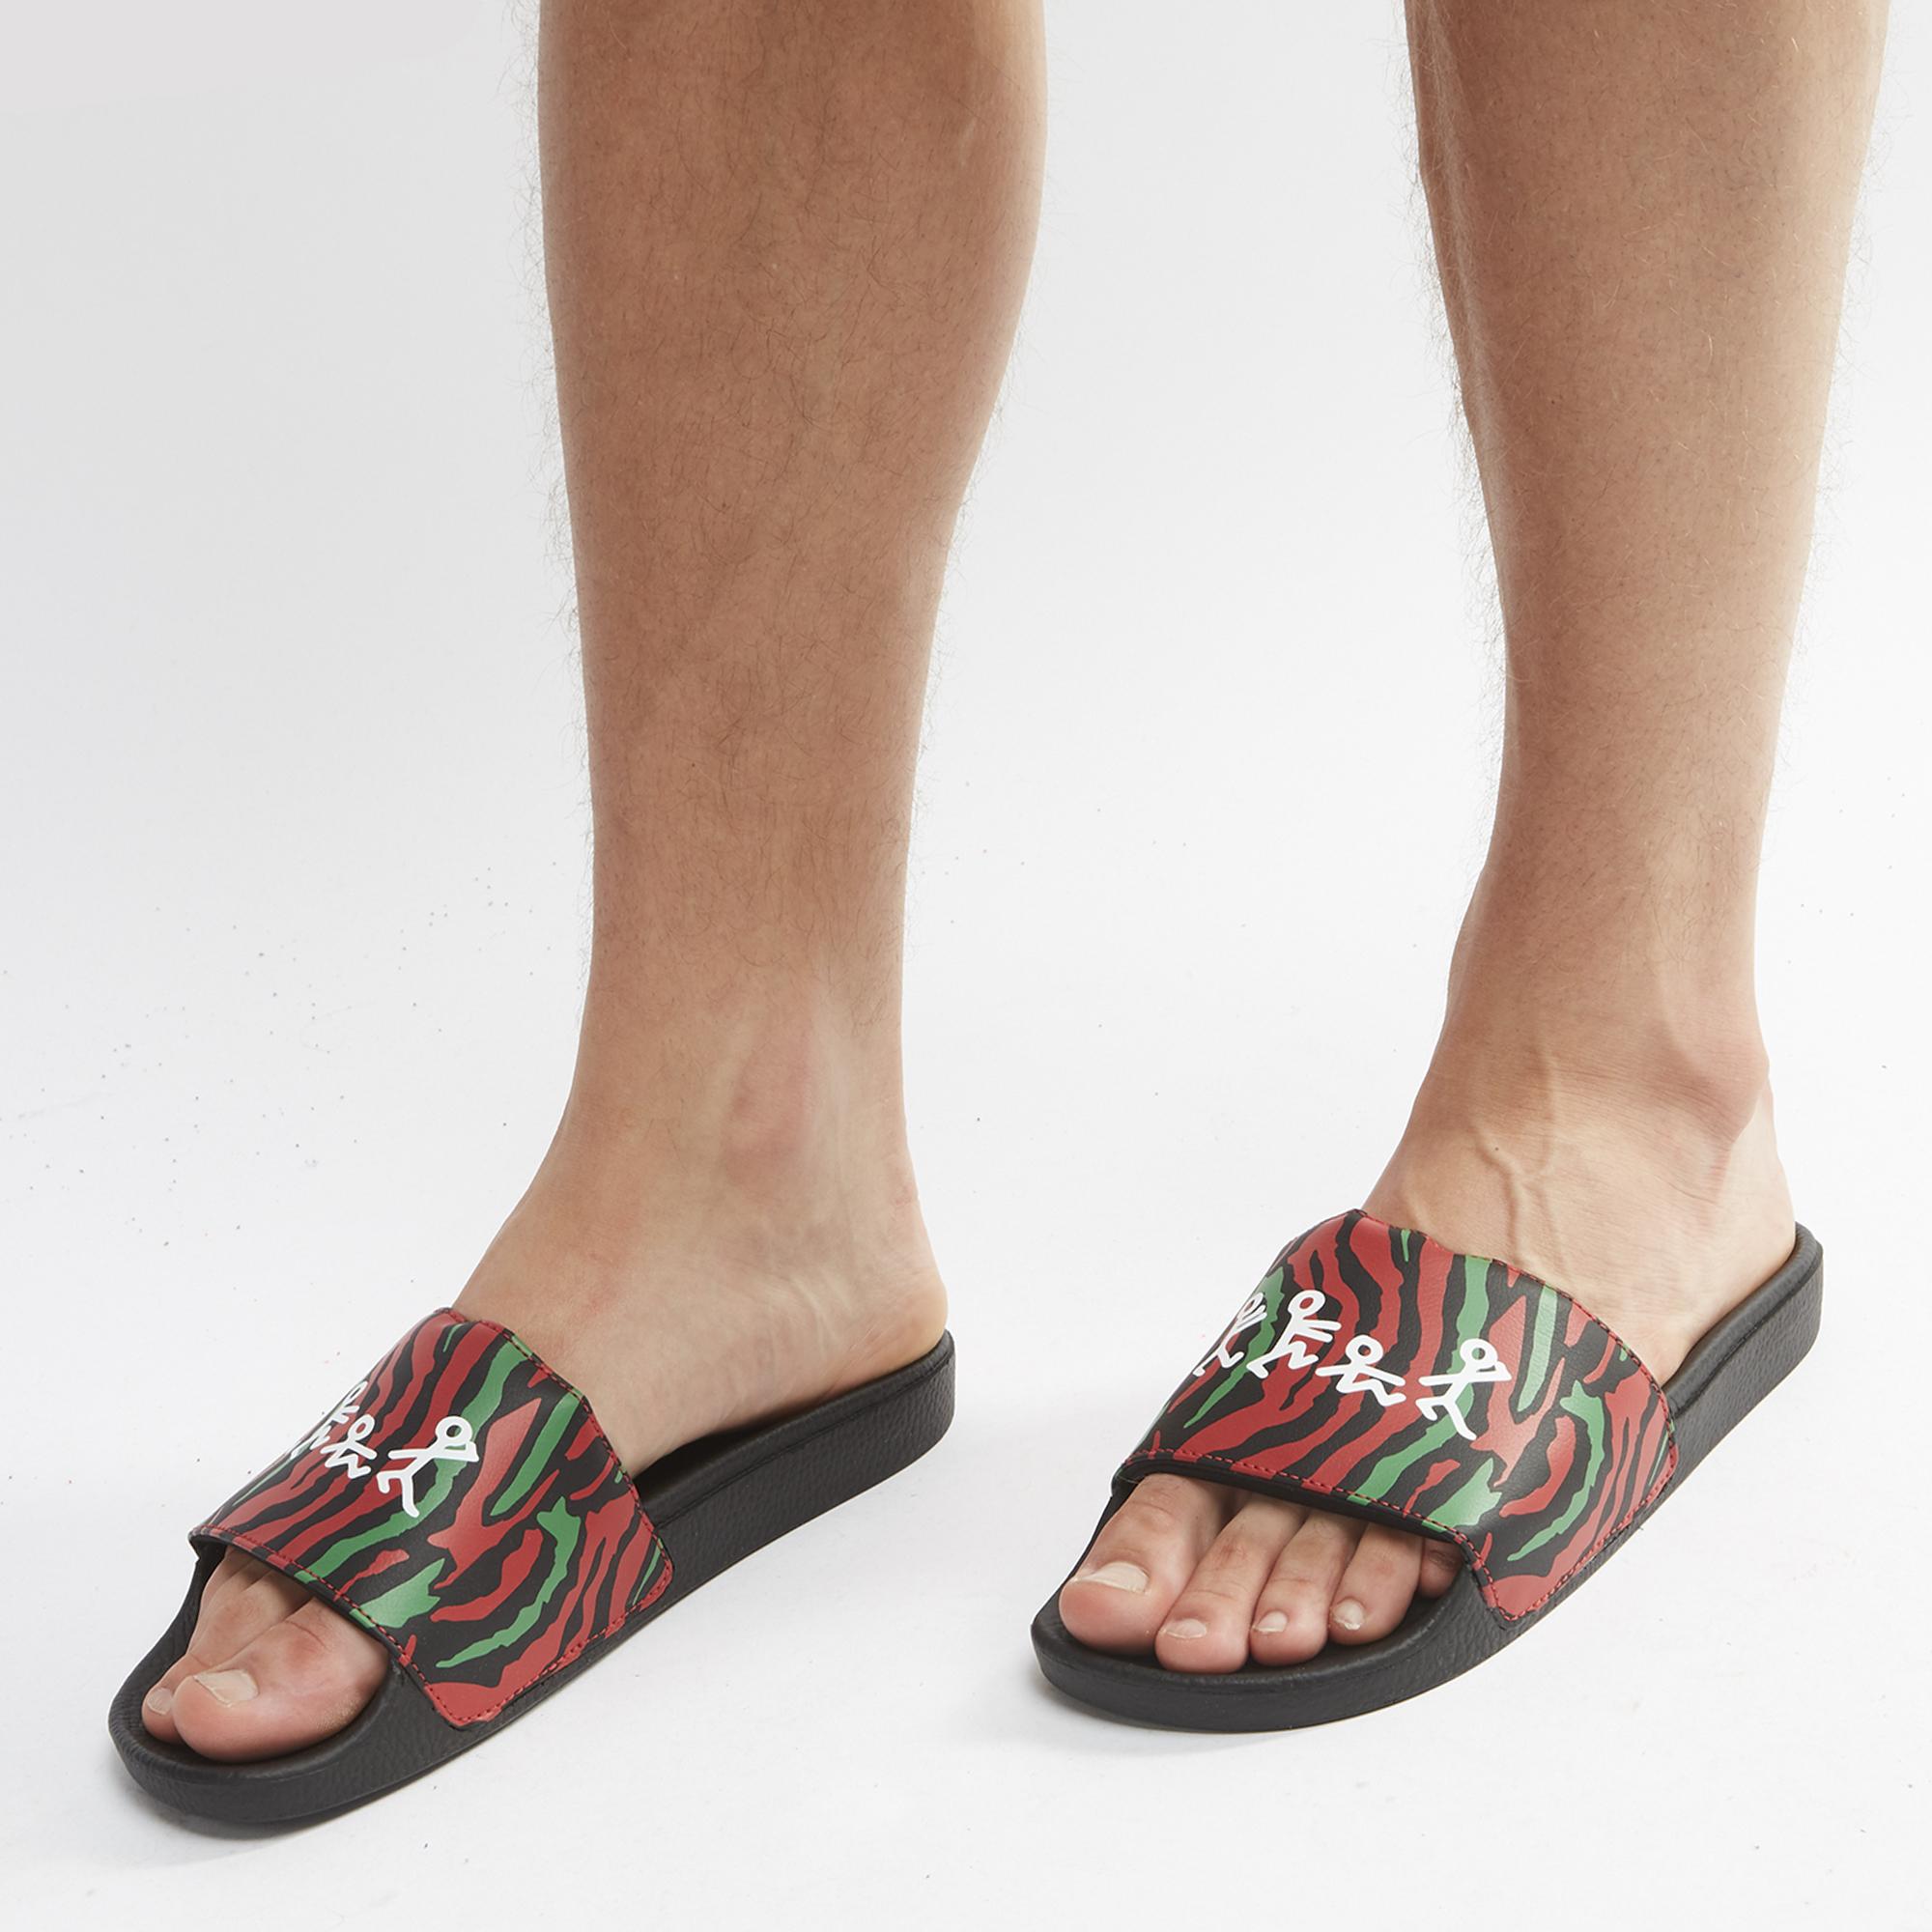 96f2a604 Vans ATCQ Slide-On | Sandals and Flip-Flops | Shoes | Men's Sale ...